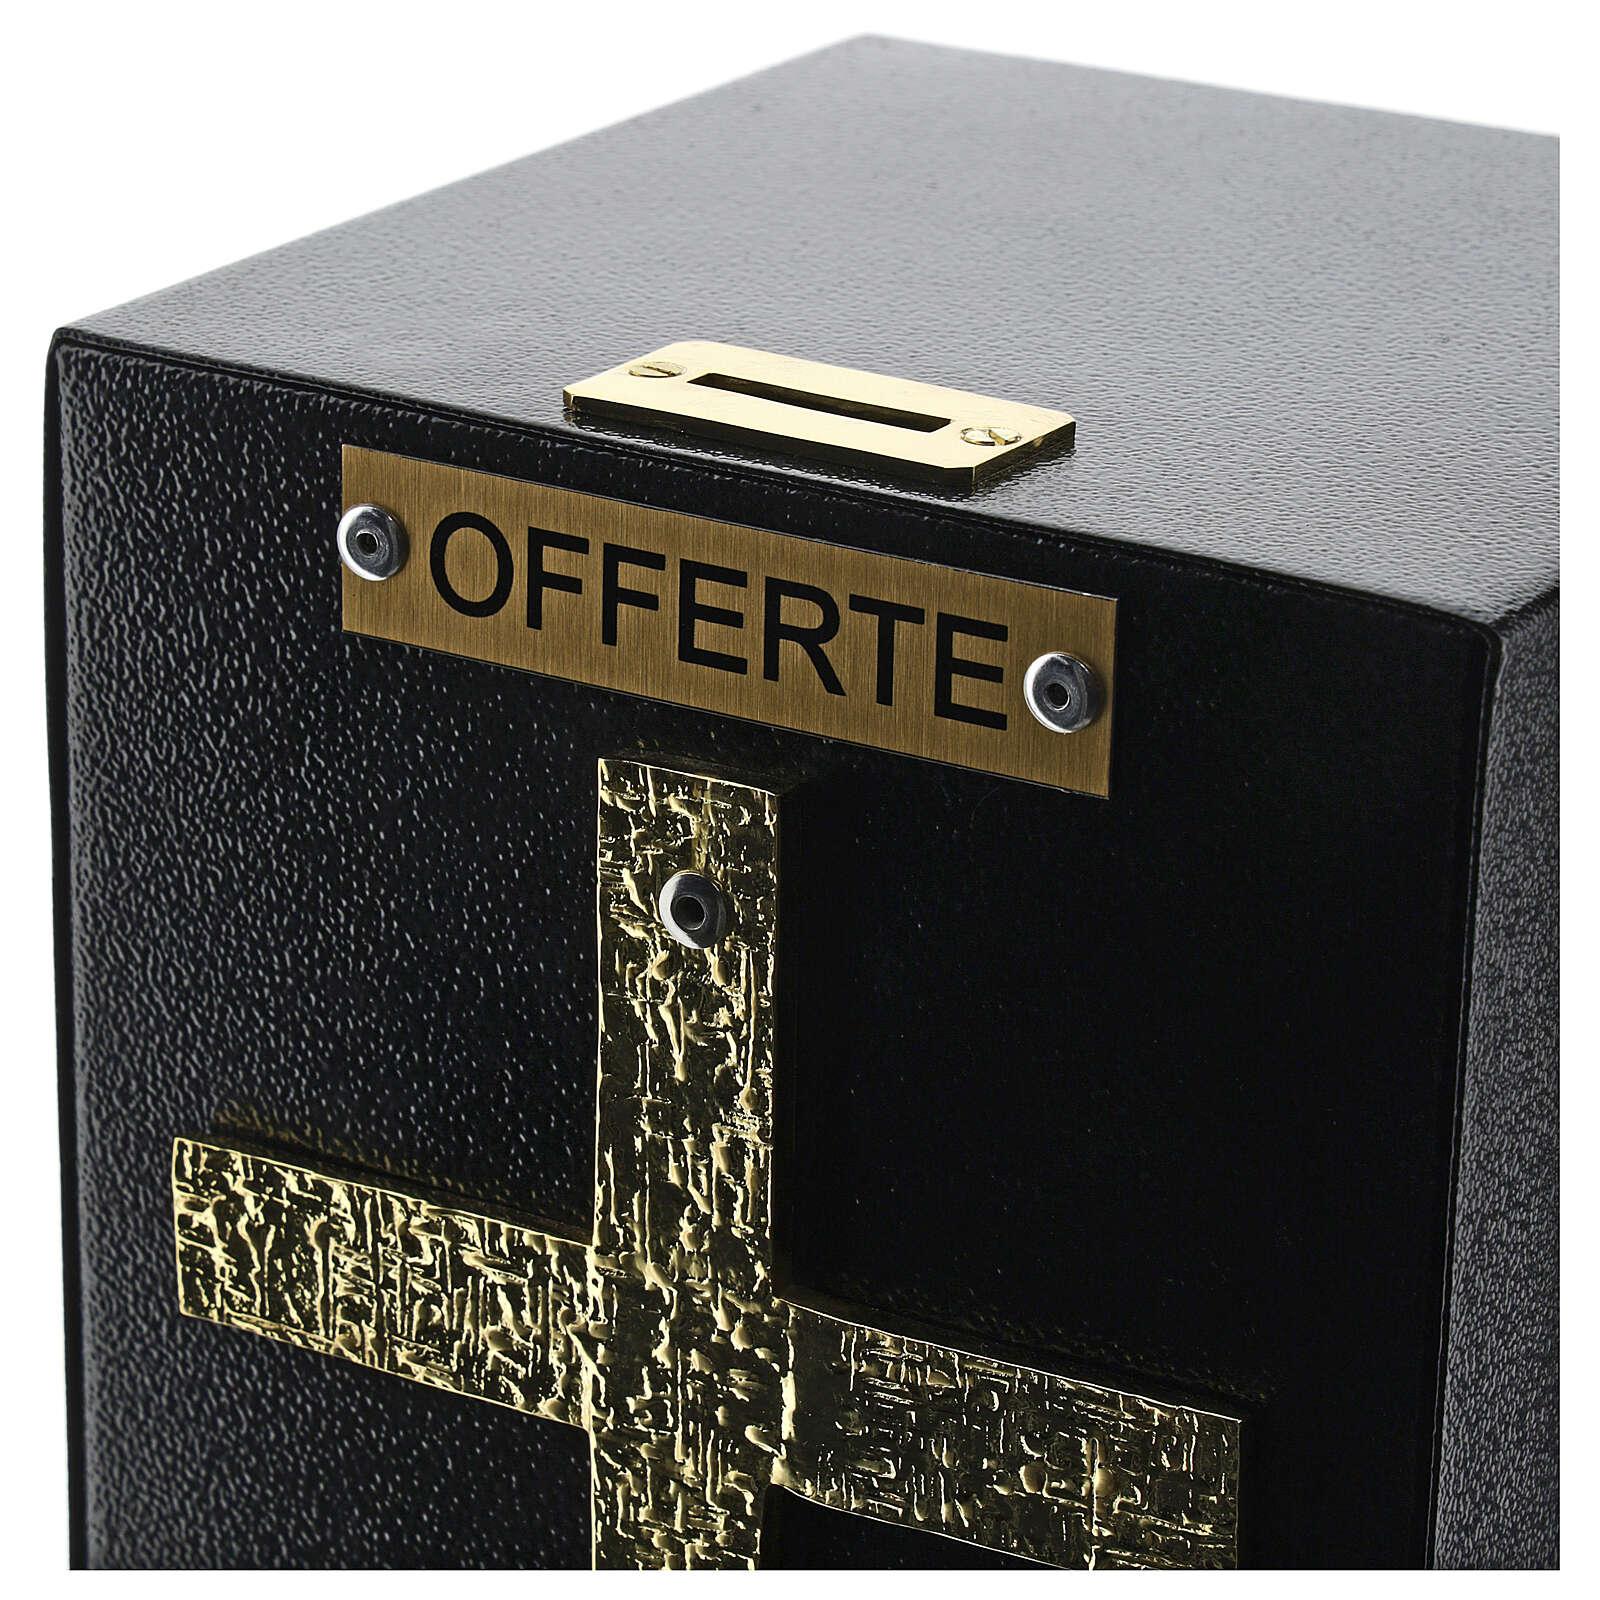 Caixa blindada bronzeada para dízimos e ofertas igreja 4